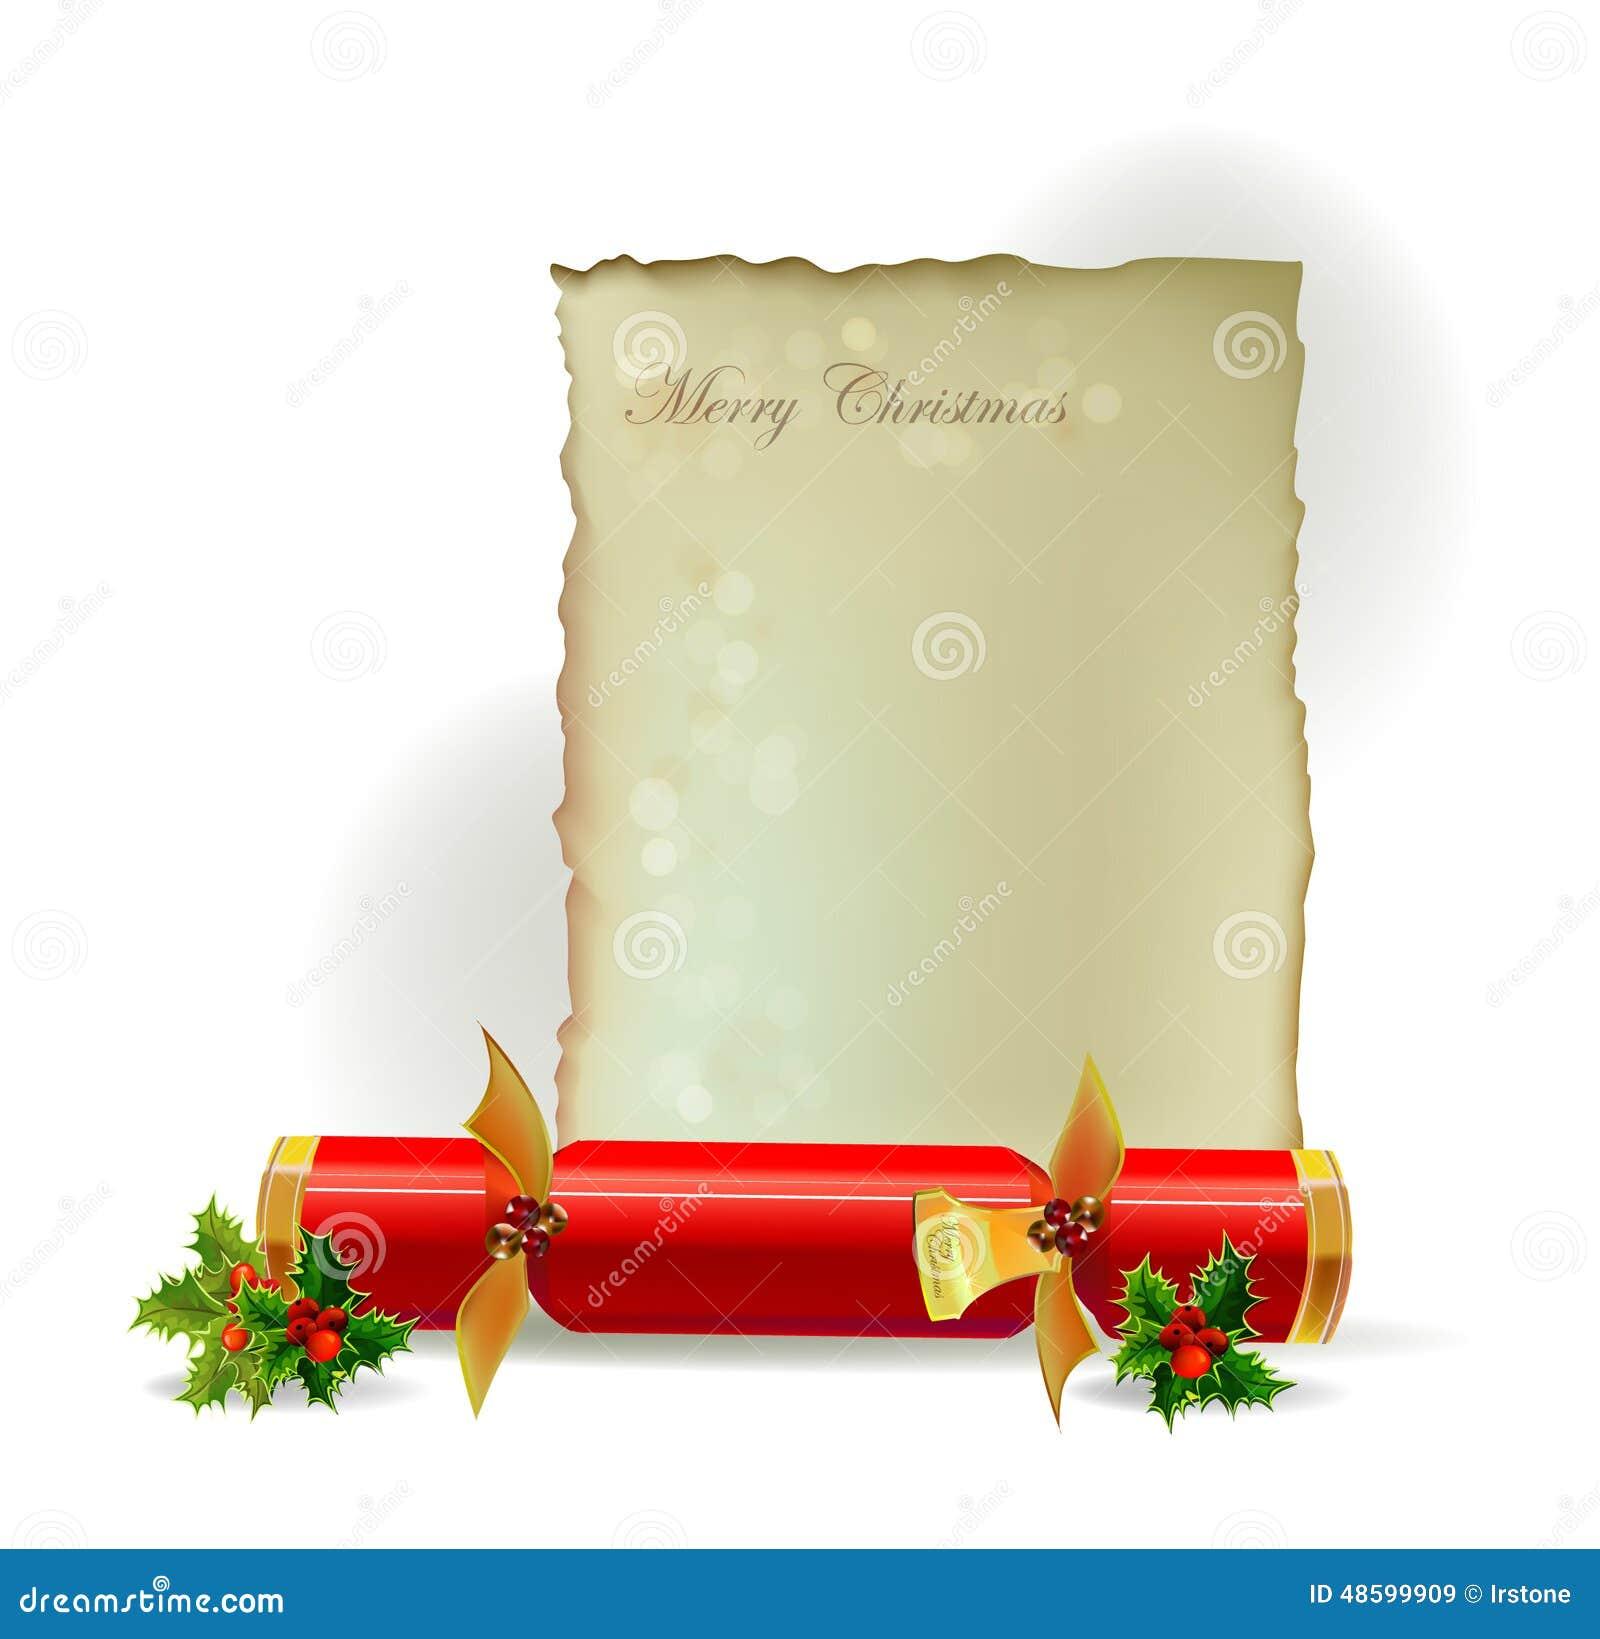 Christmas Cracker Template.Christmas Cracker And Letter Template Stock Illustration